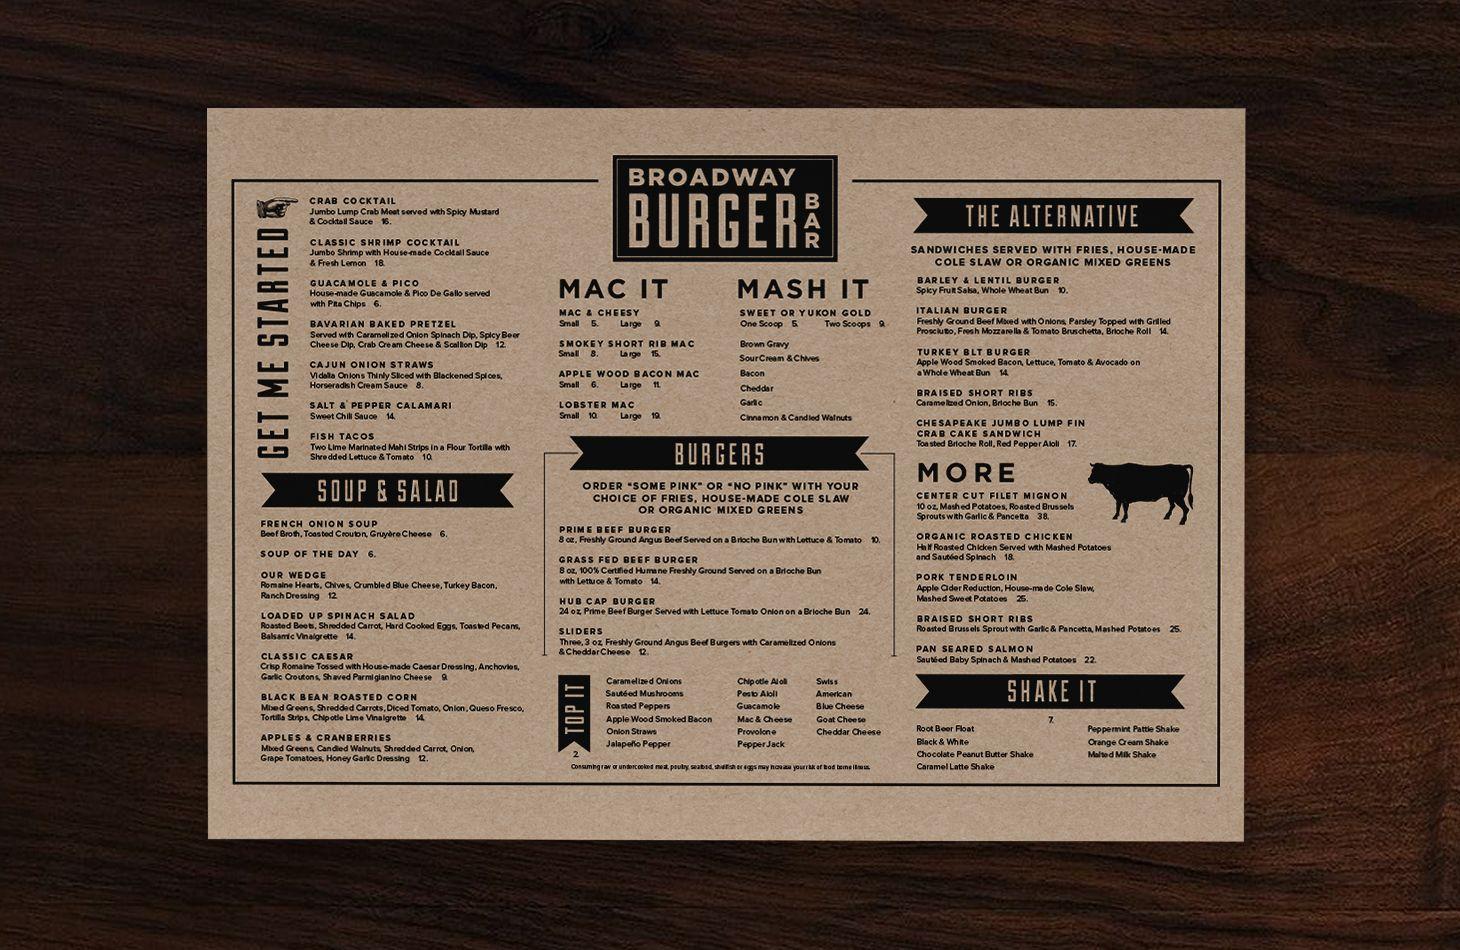 Cool Restaurant Menu Design Broadway Burger Bar Dinner Menu 3 Jpg